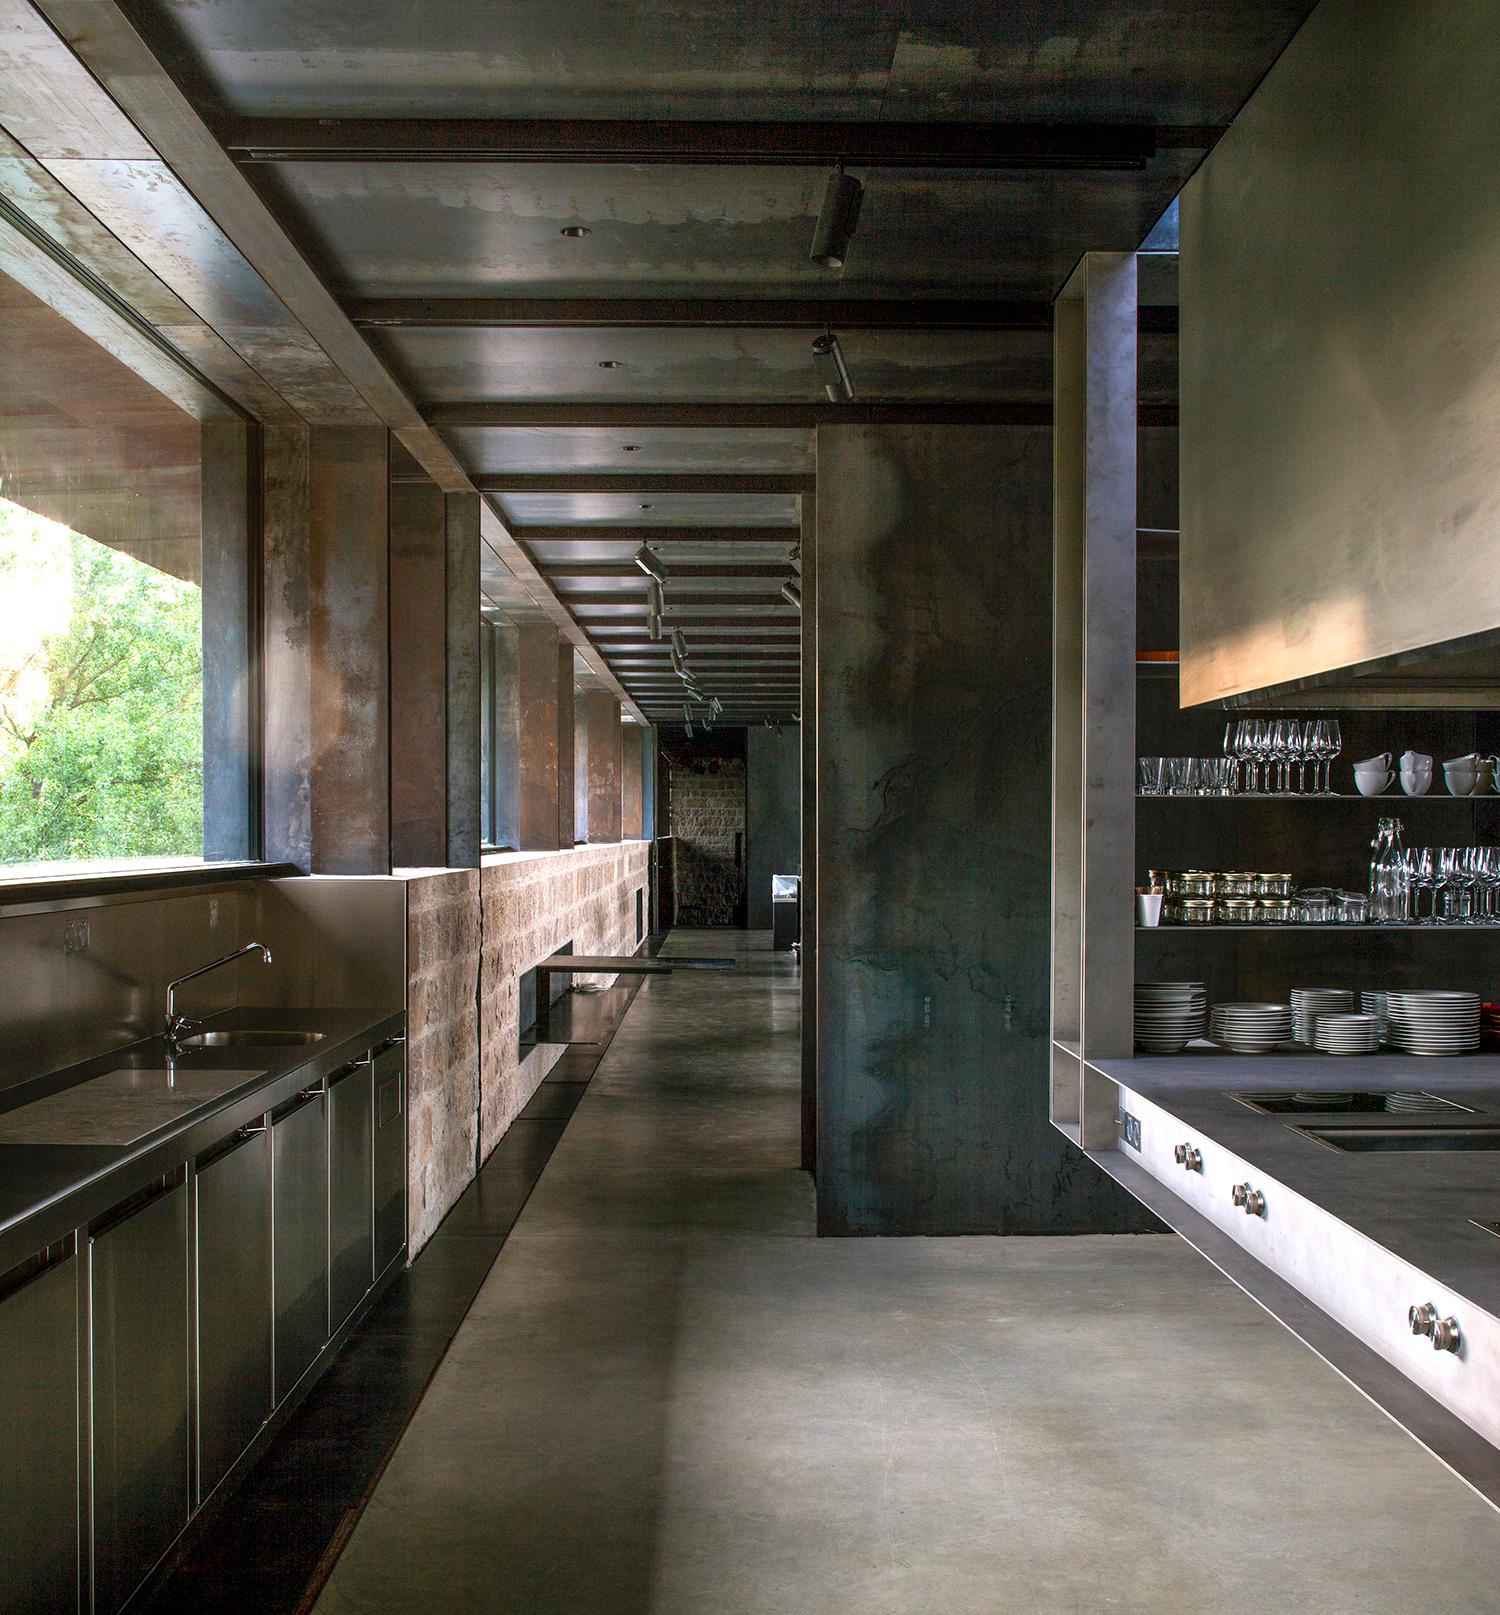 La Cuisine Art Center Negrepelisse France Photo By Hisao Suzuki